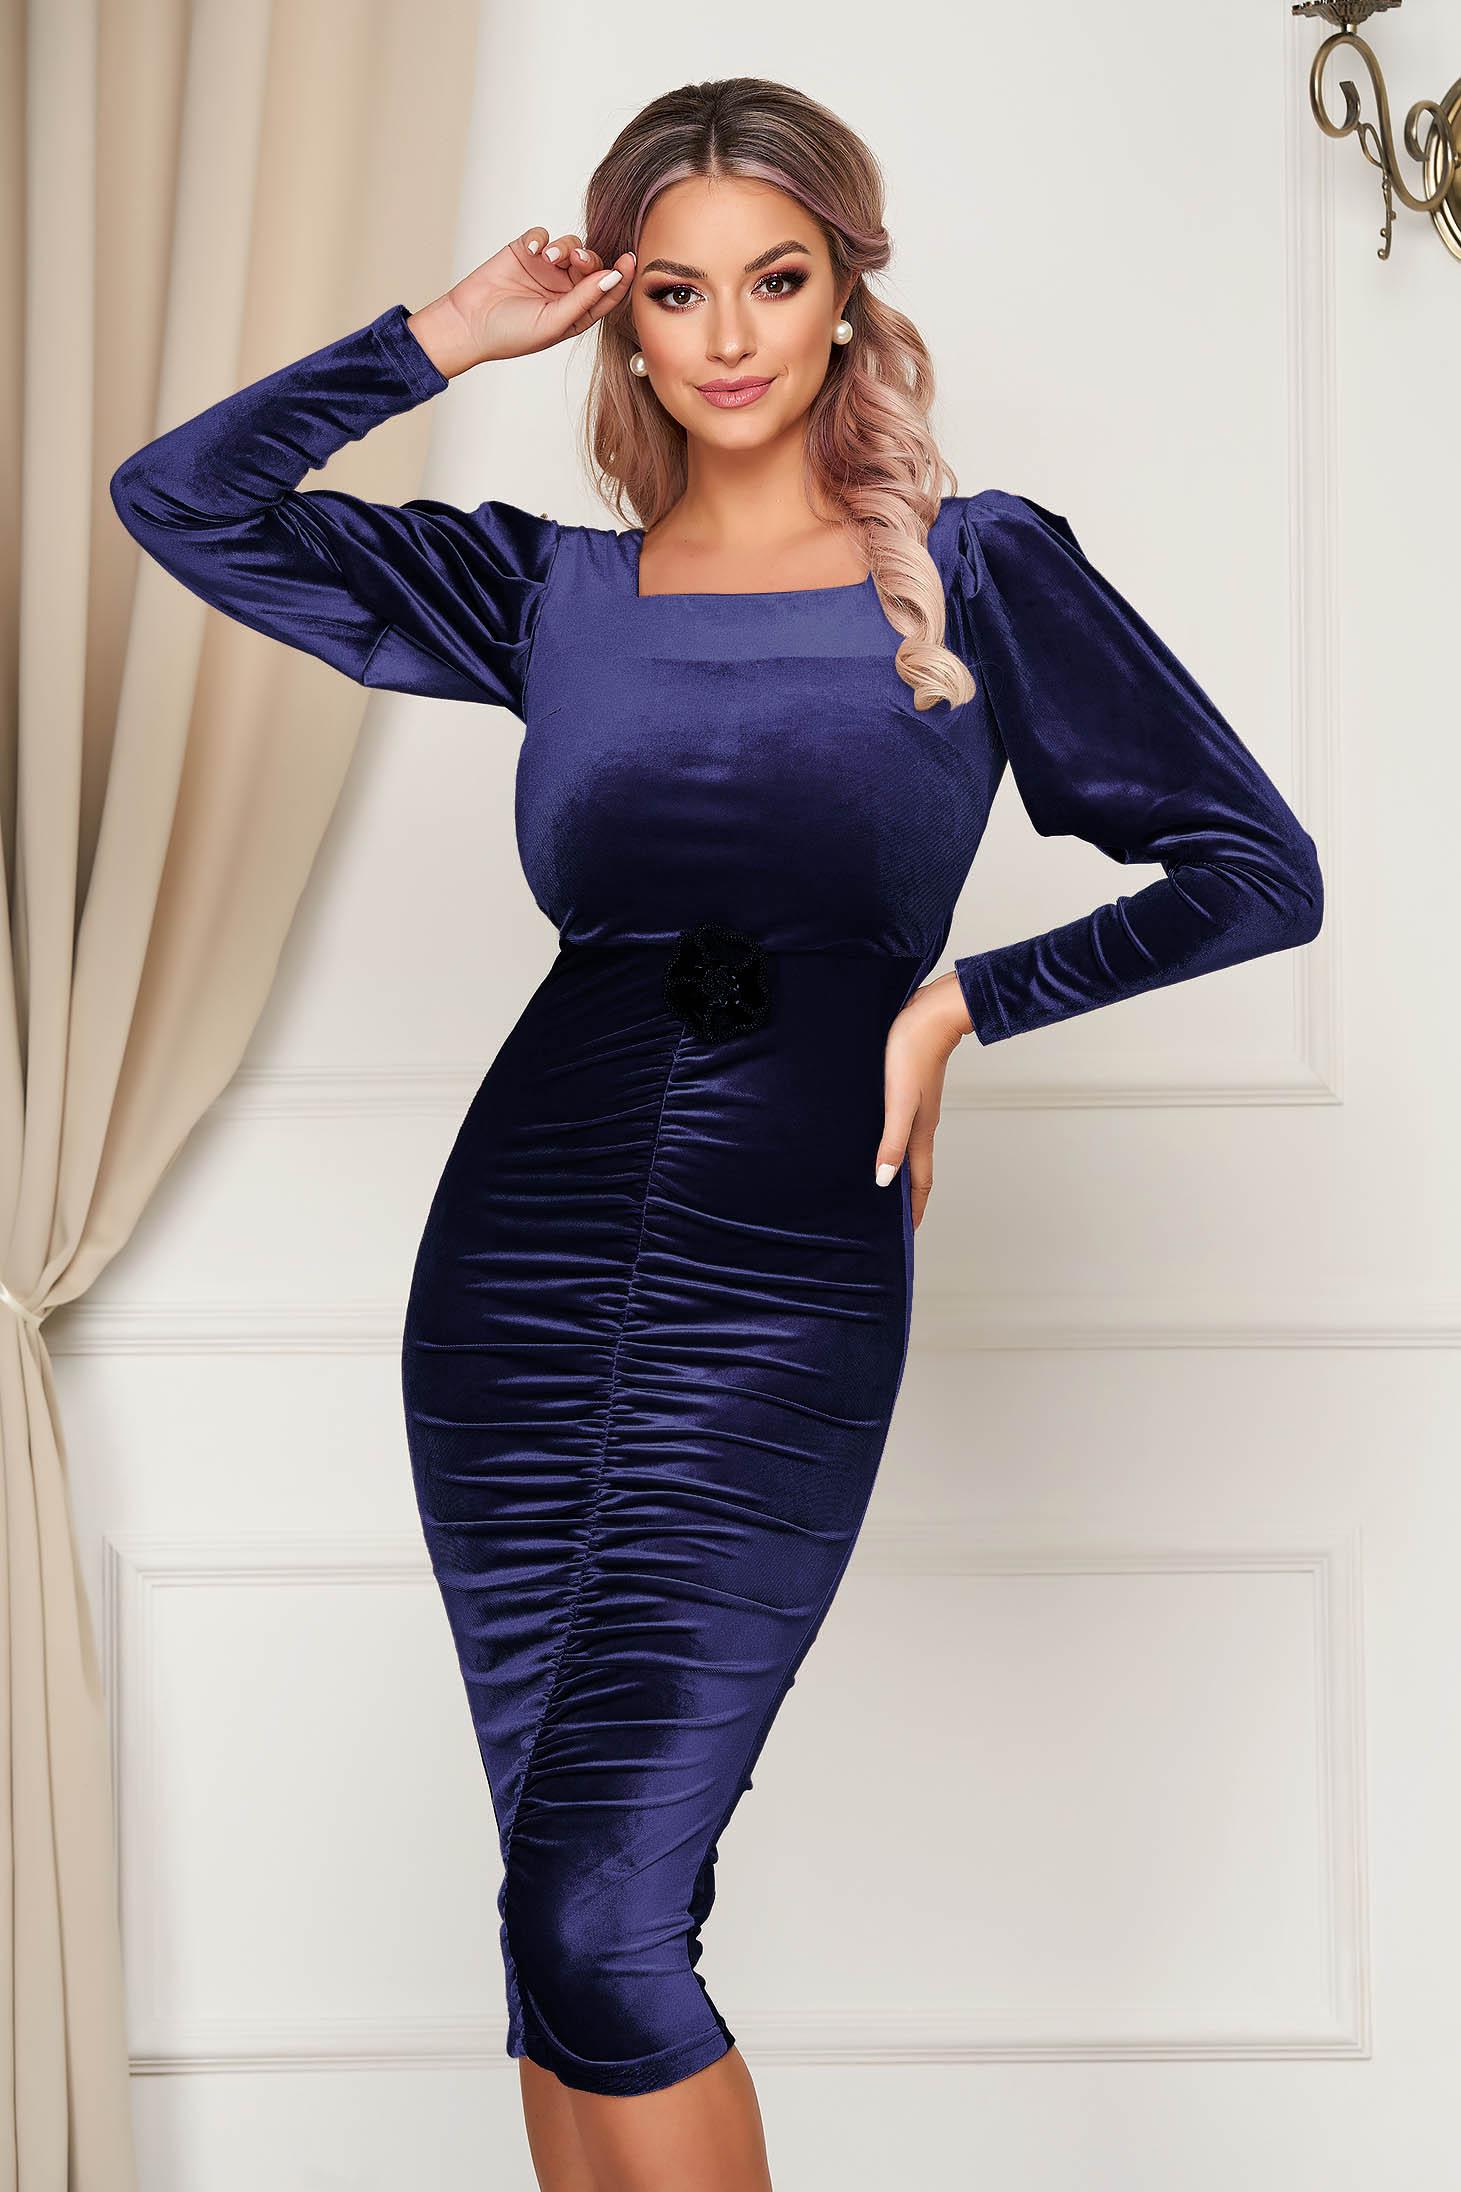 Darkblue dress from velvet long sleeved occasional pencil flower shaped accessory